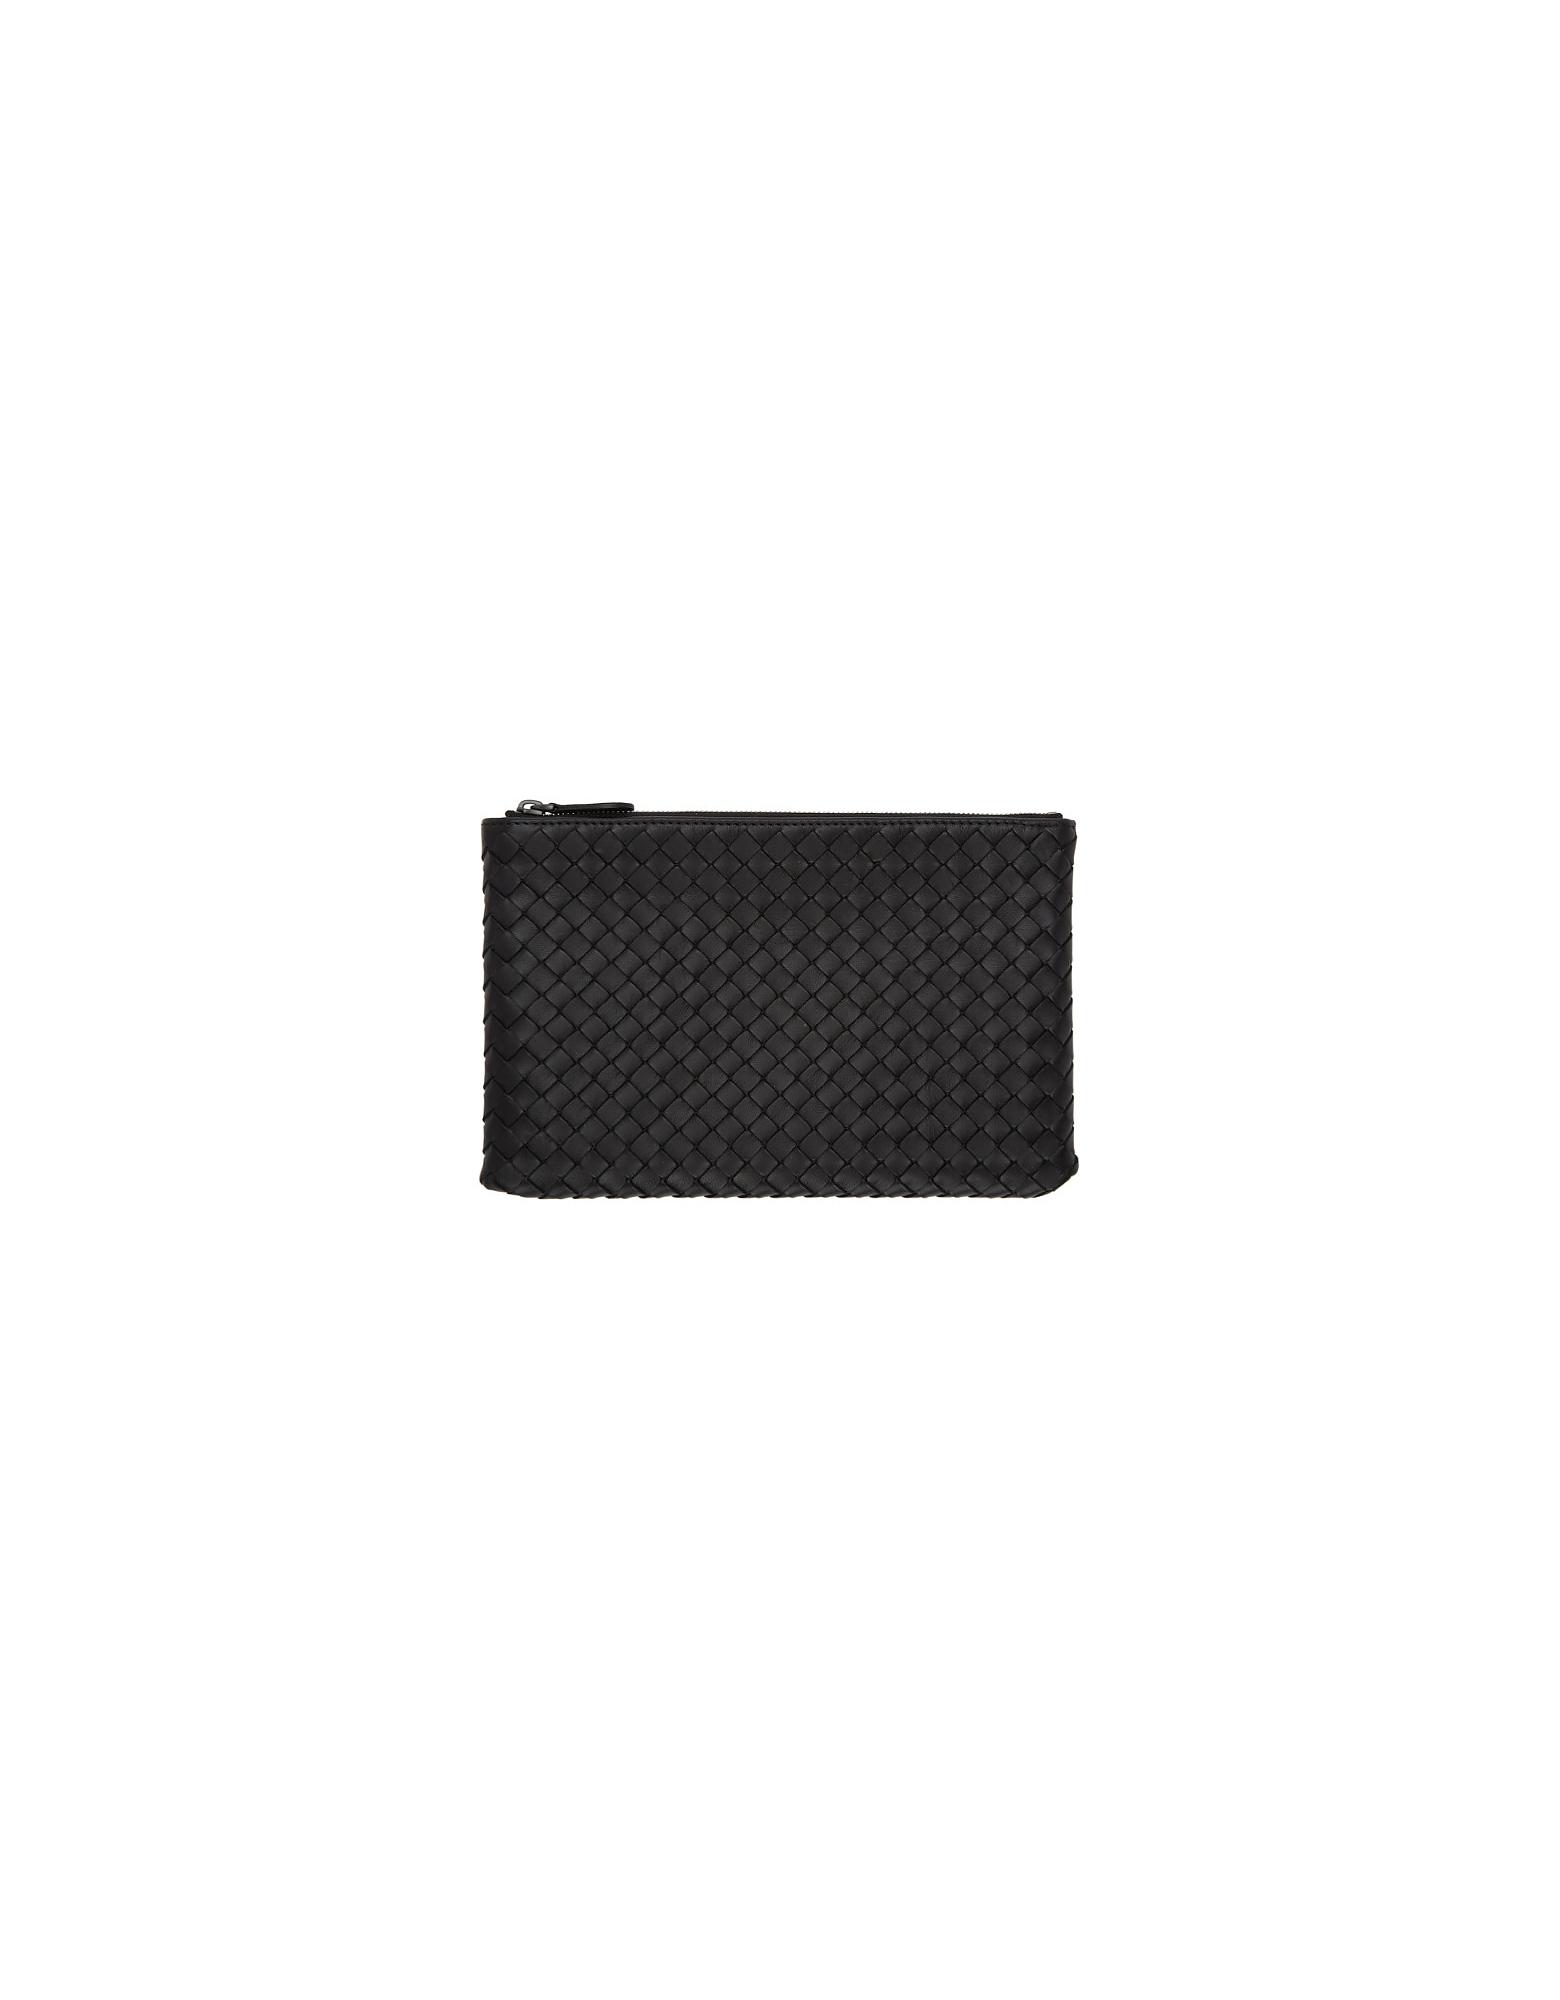 Bottega Veneta Designer Handbags, Black Intrecciato Medium Pouch